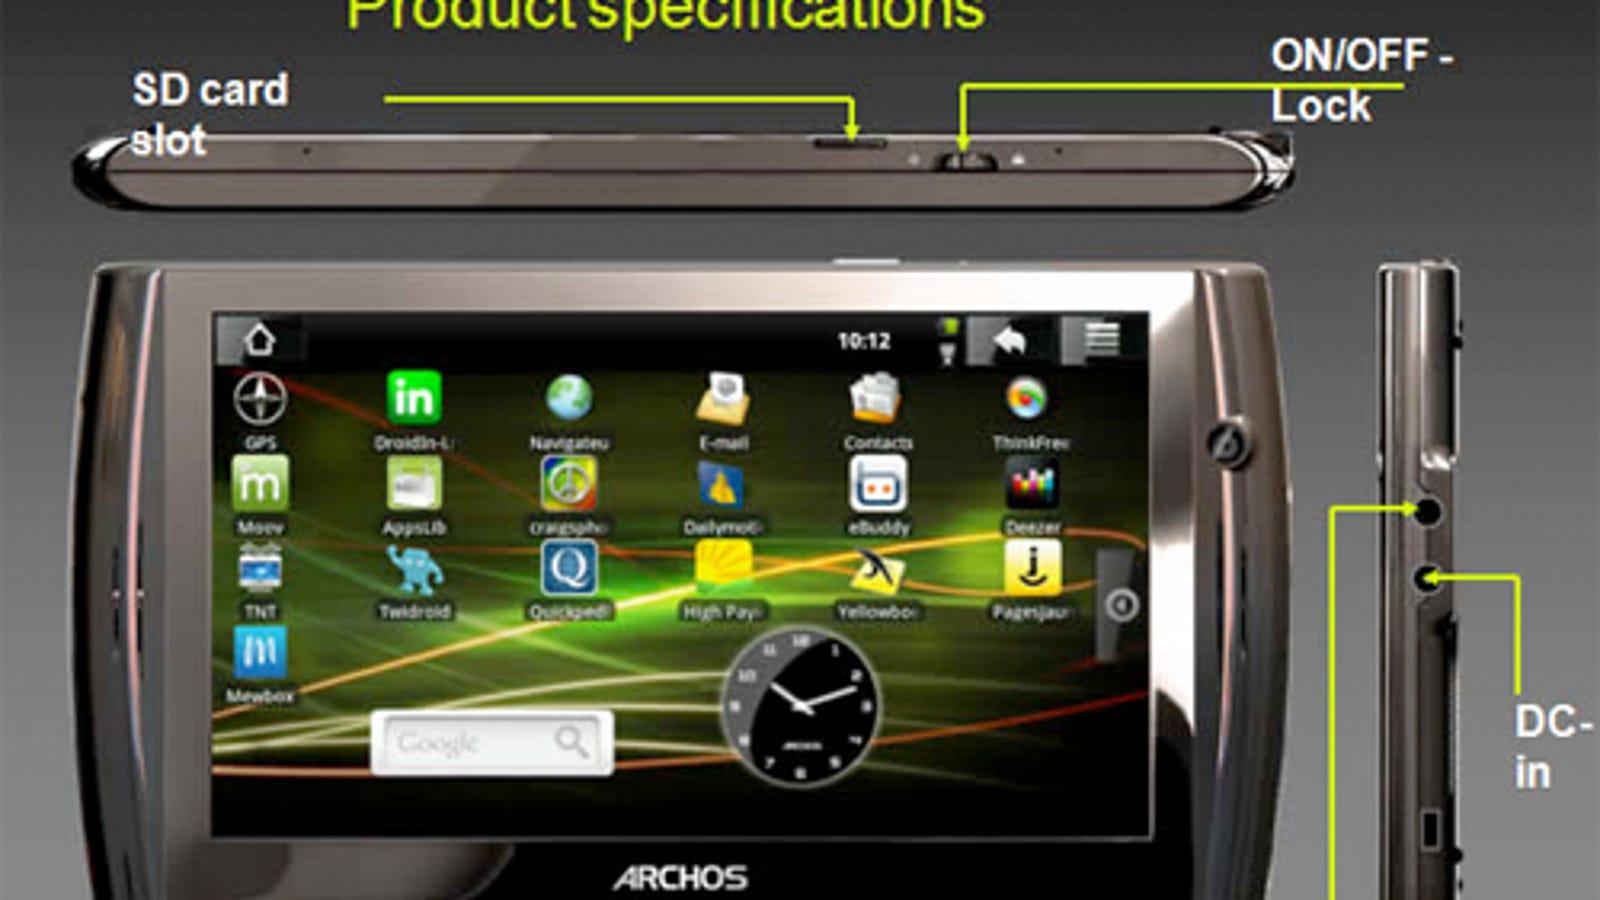 beste groothandel beste verkoop populaire winkels Archos 7 Android Tablet Leaked, Featuring Webcam For Video ...